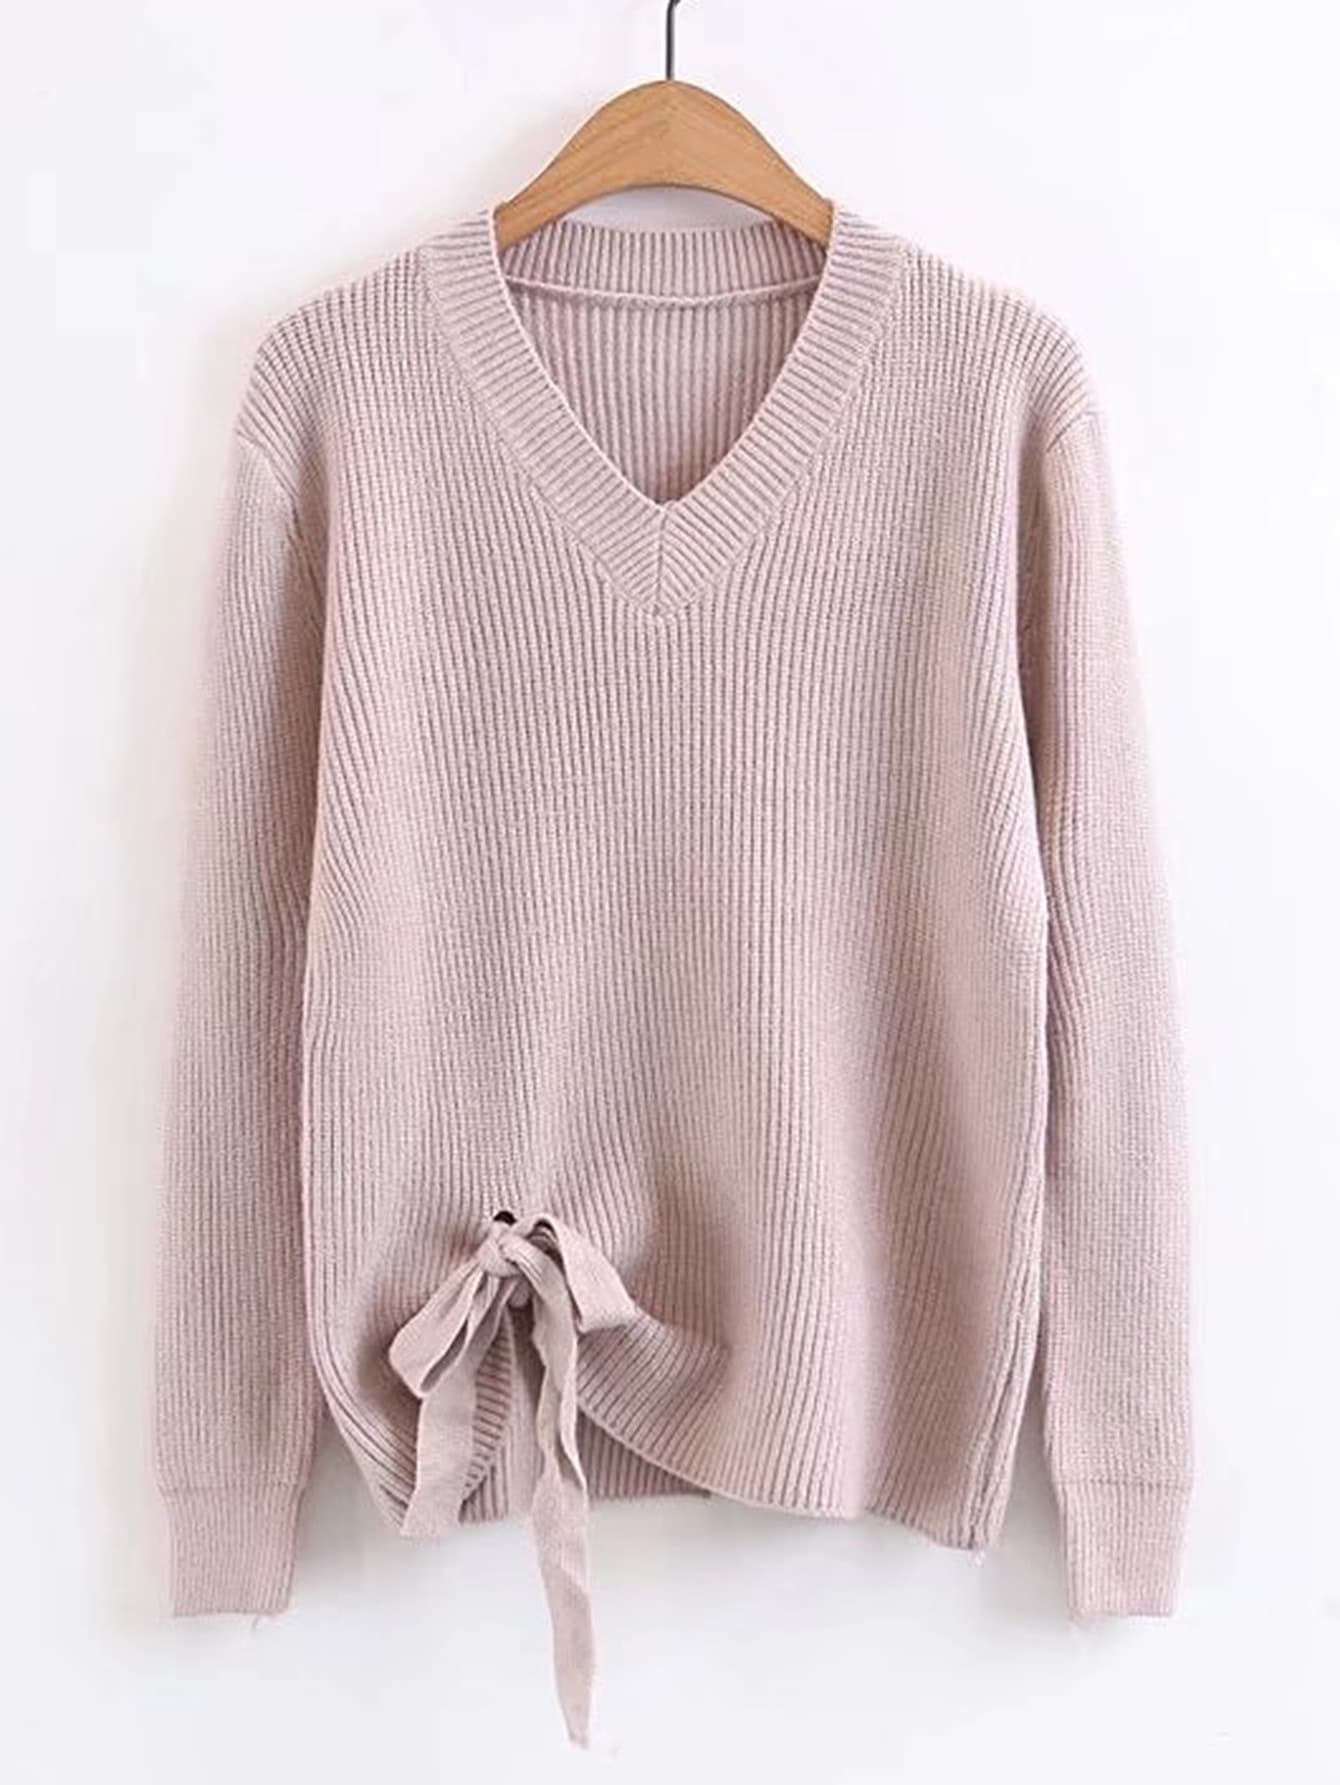 Ribbed Trim Knot Hem Sweater sweater170804203